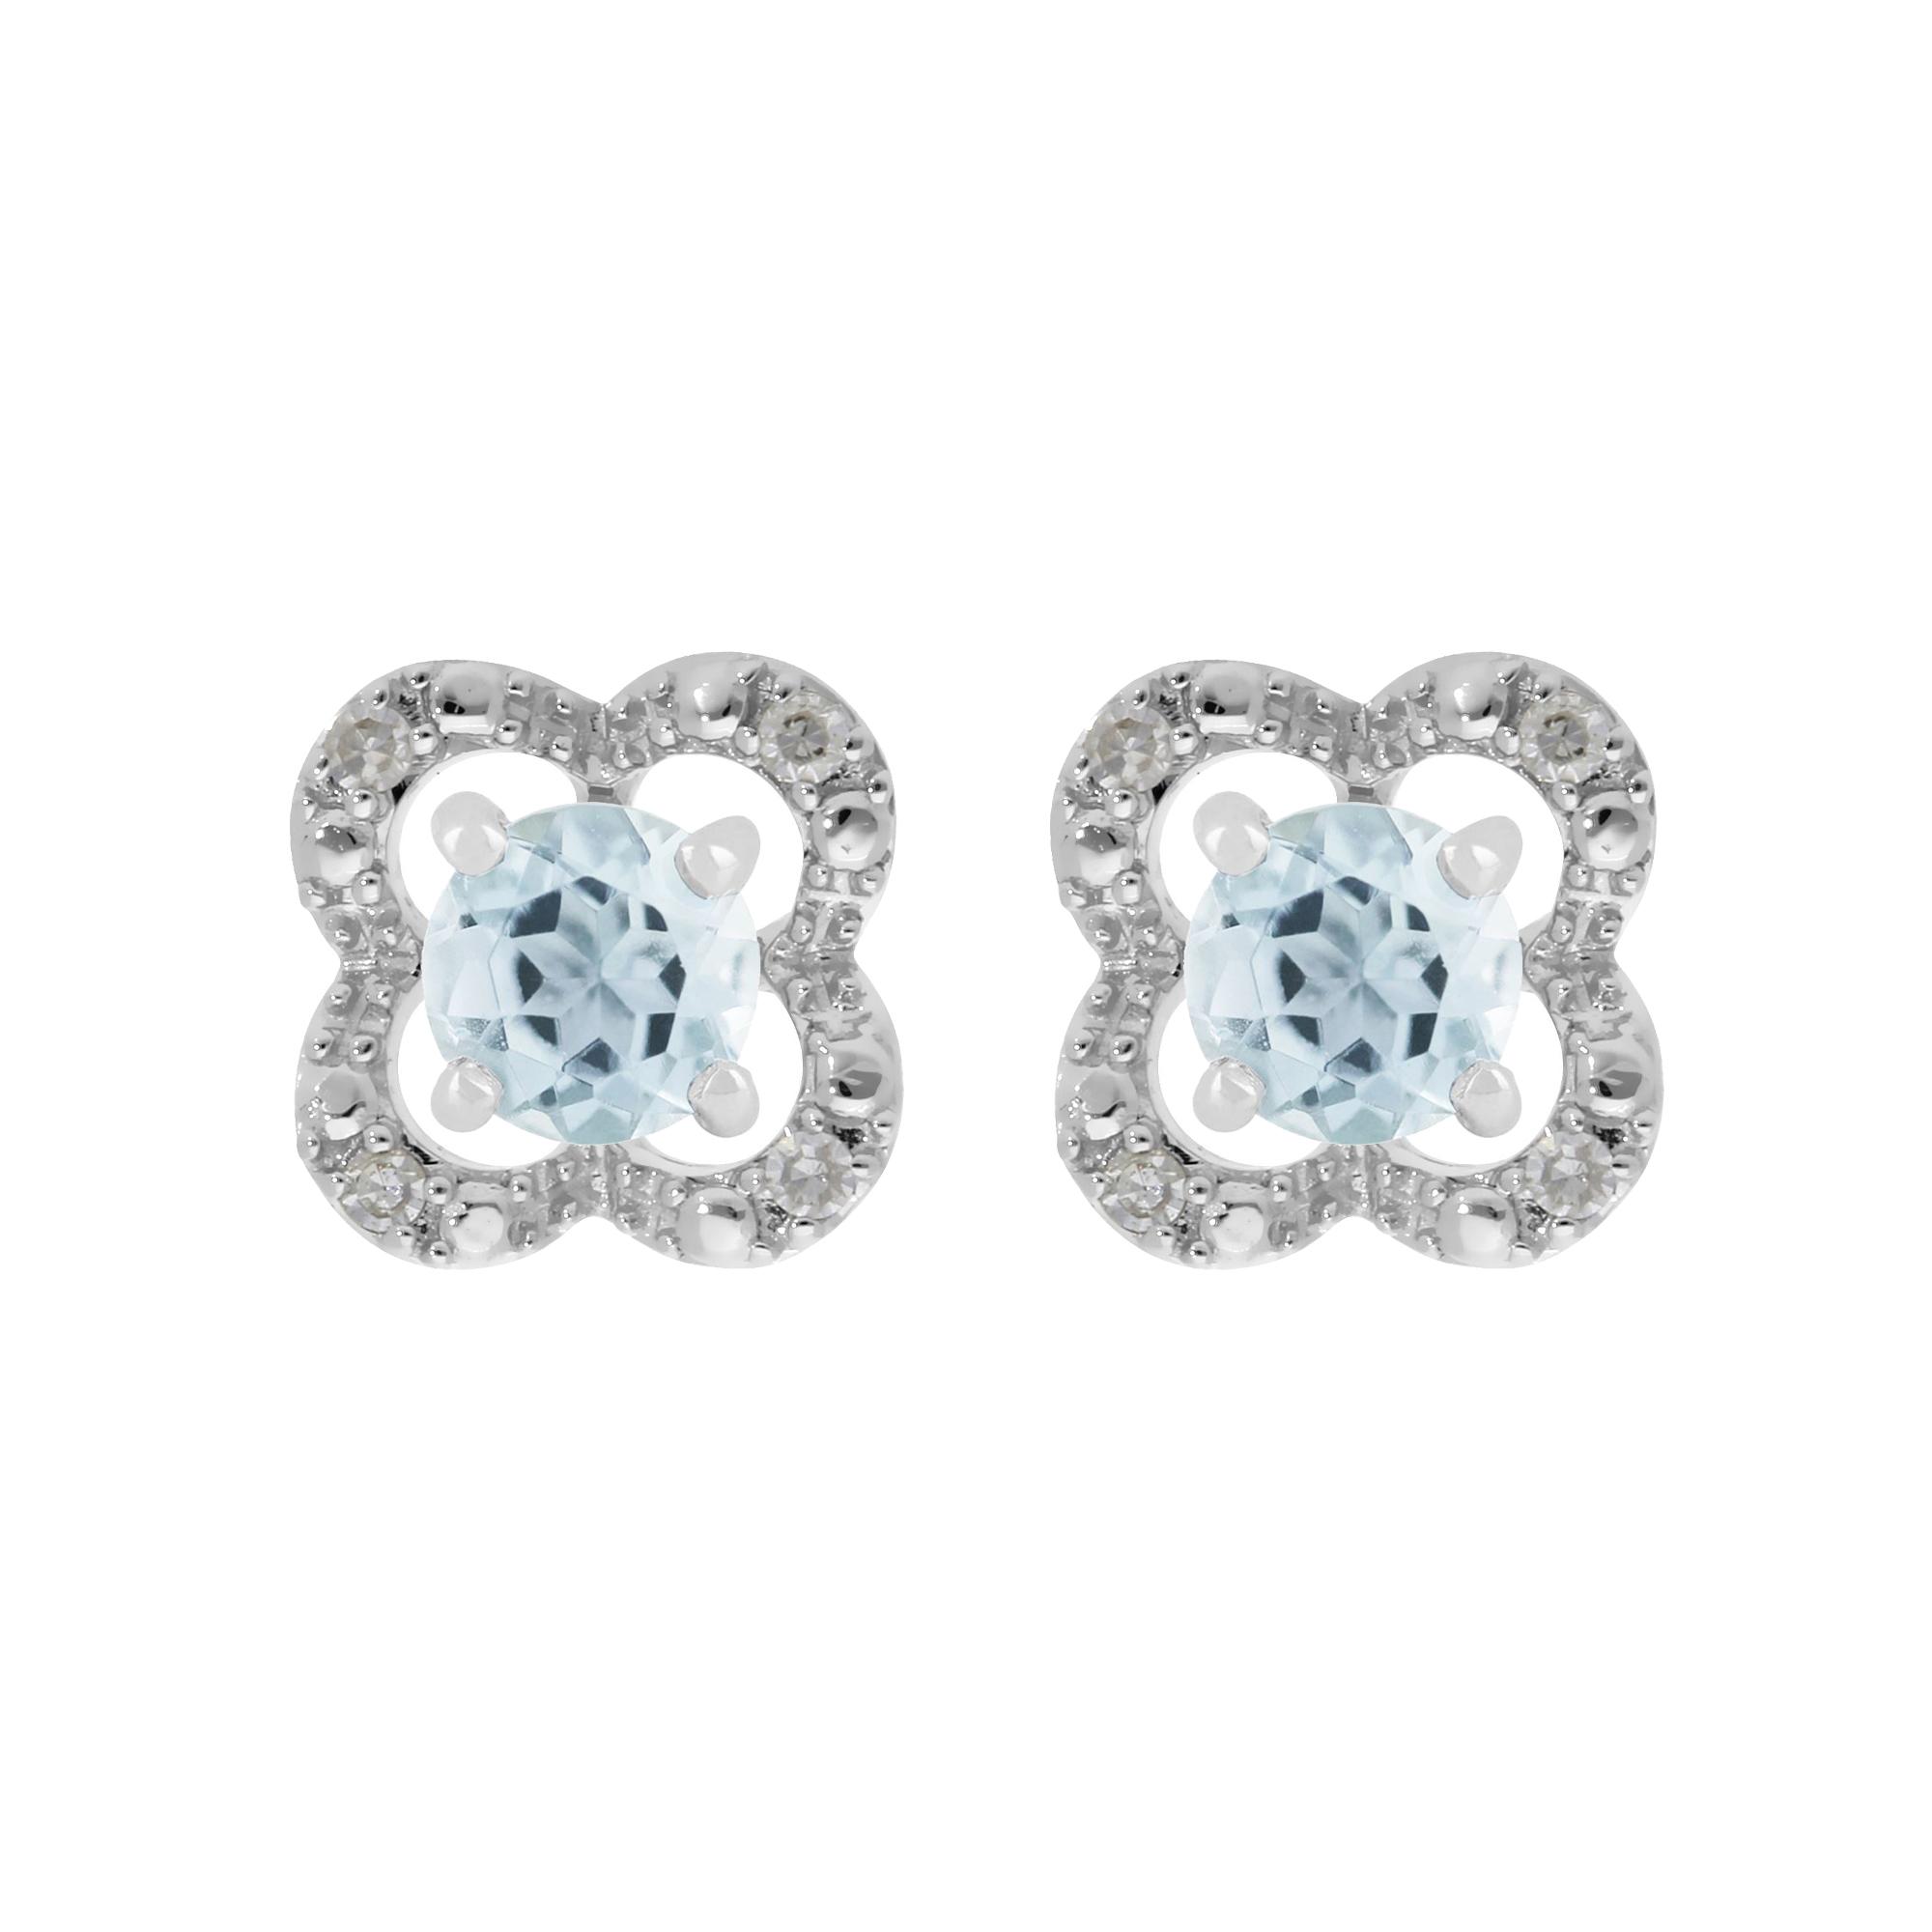 8896ea6a4ecbc Details about 9ct White Gold Aquamarine Stud Earrings & Detachable Diamond  Flower Ear Jacket